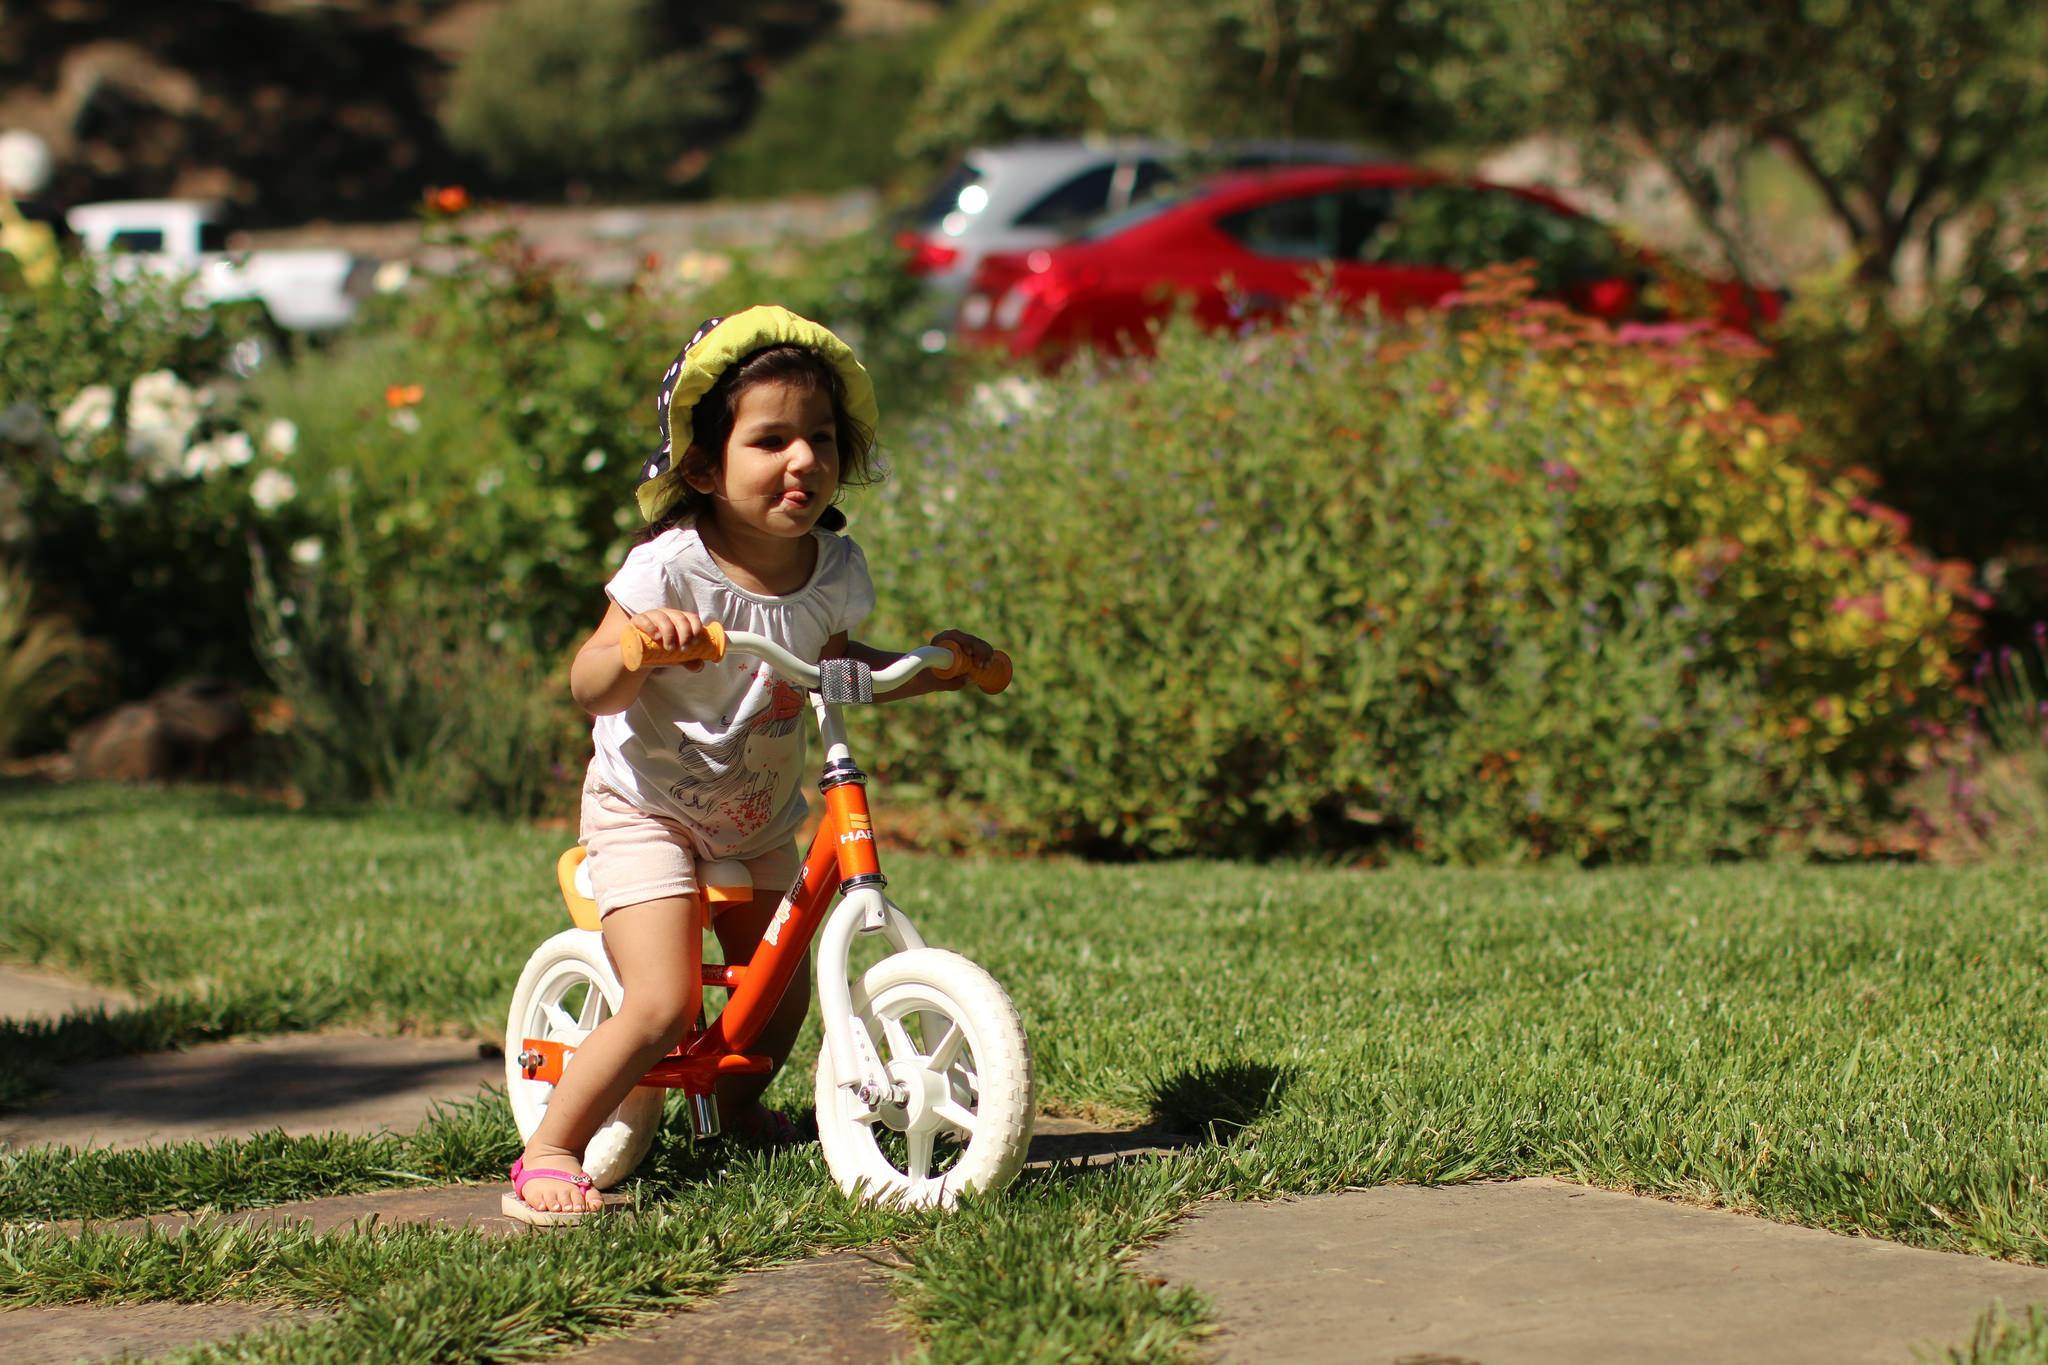 anisa_riding_bike